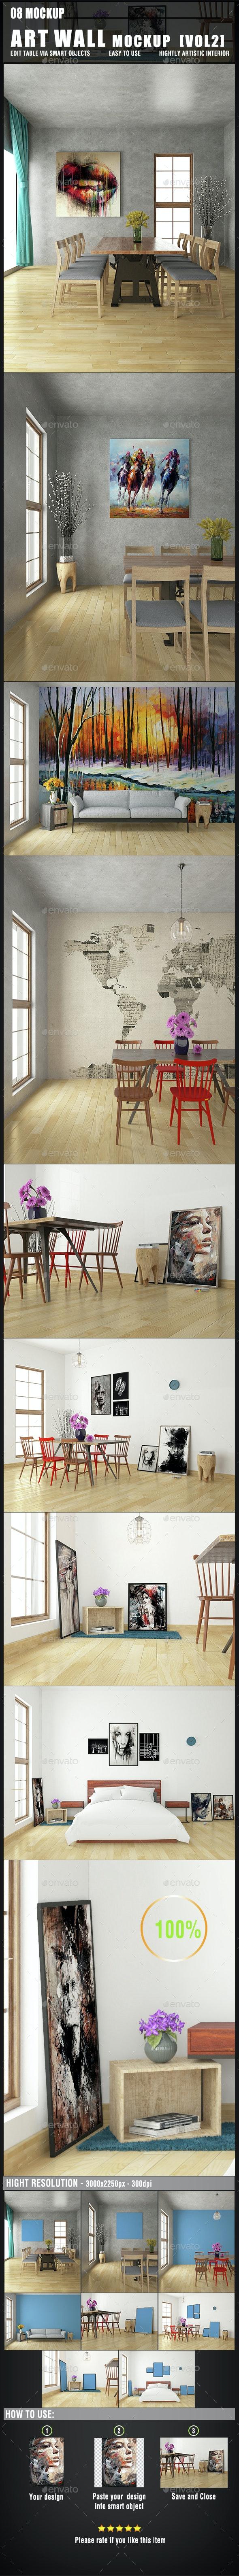 Art Wall Mockup [Vol2] - Miscellaneous Print